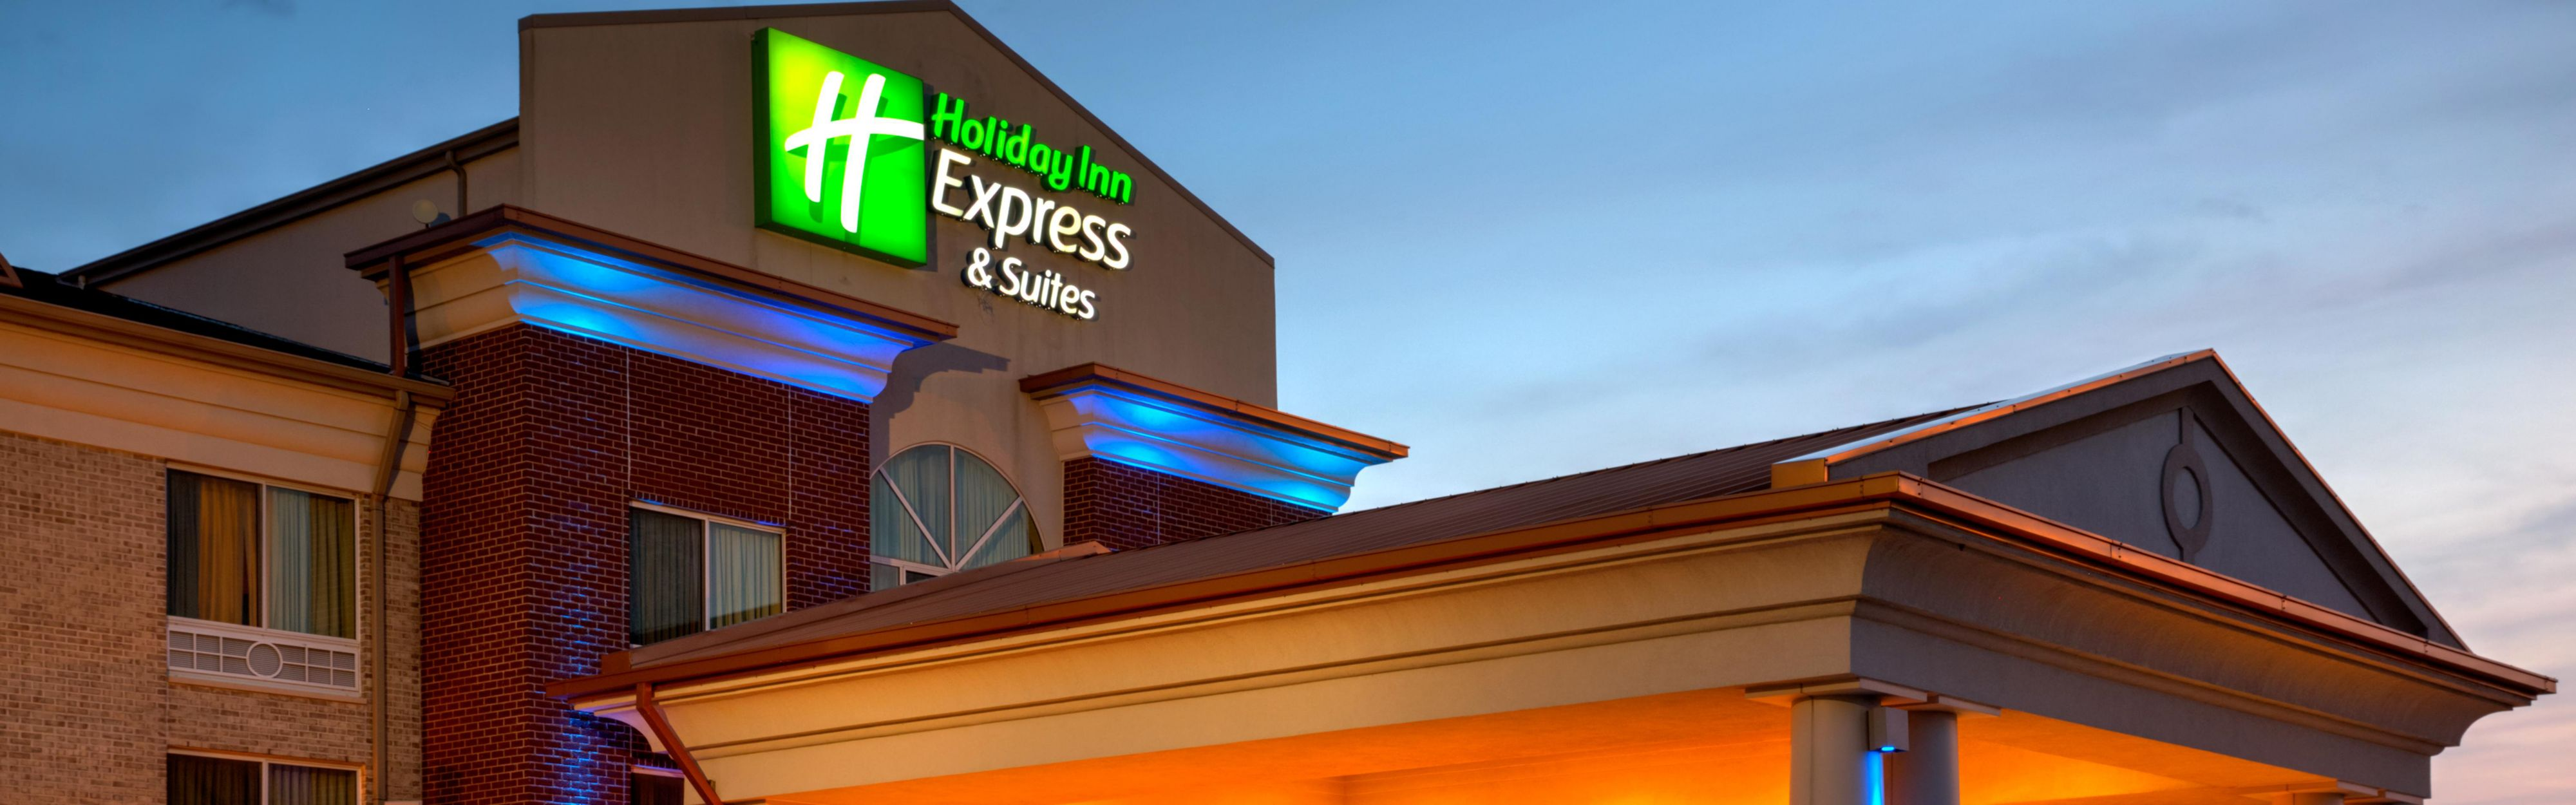 Holiday Inn Express & Suites Vandalia image 0